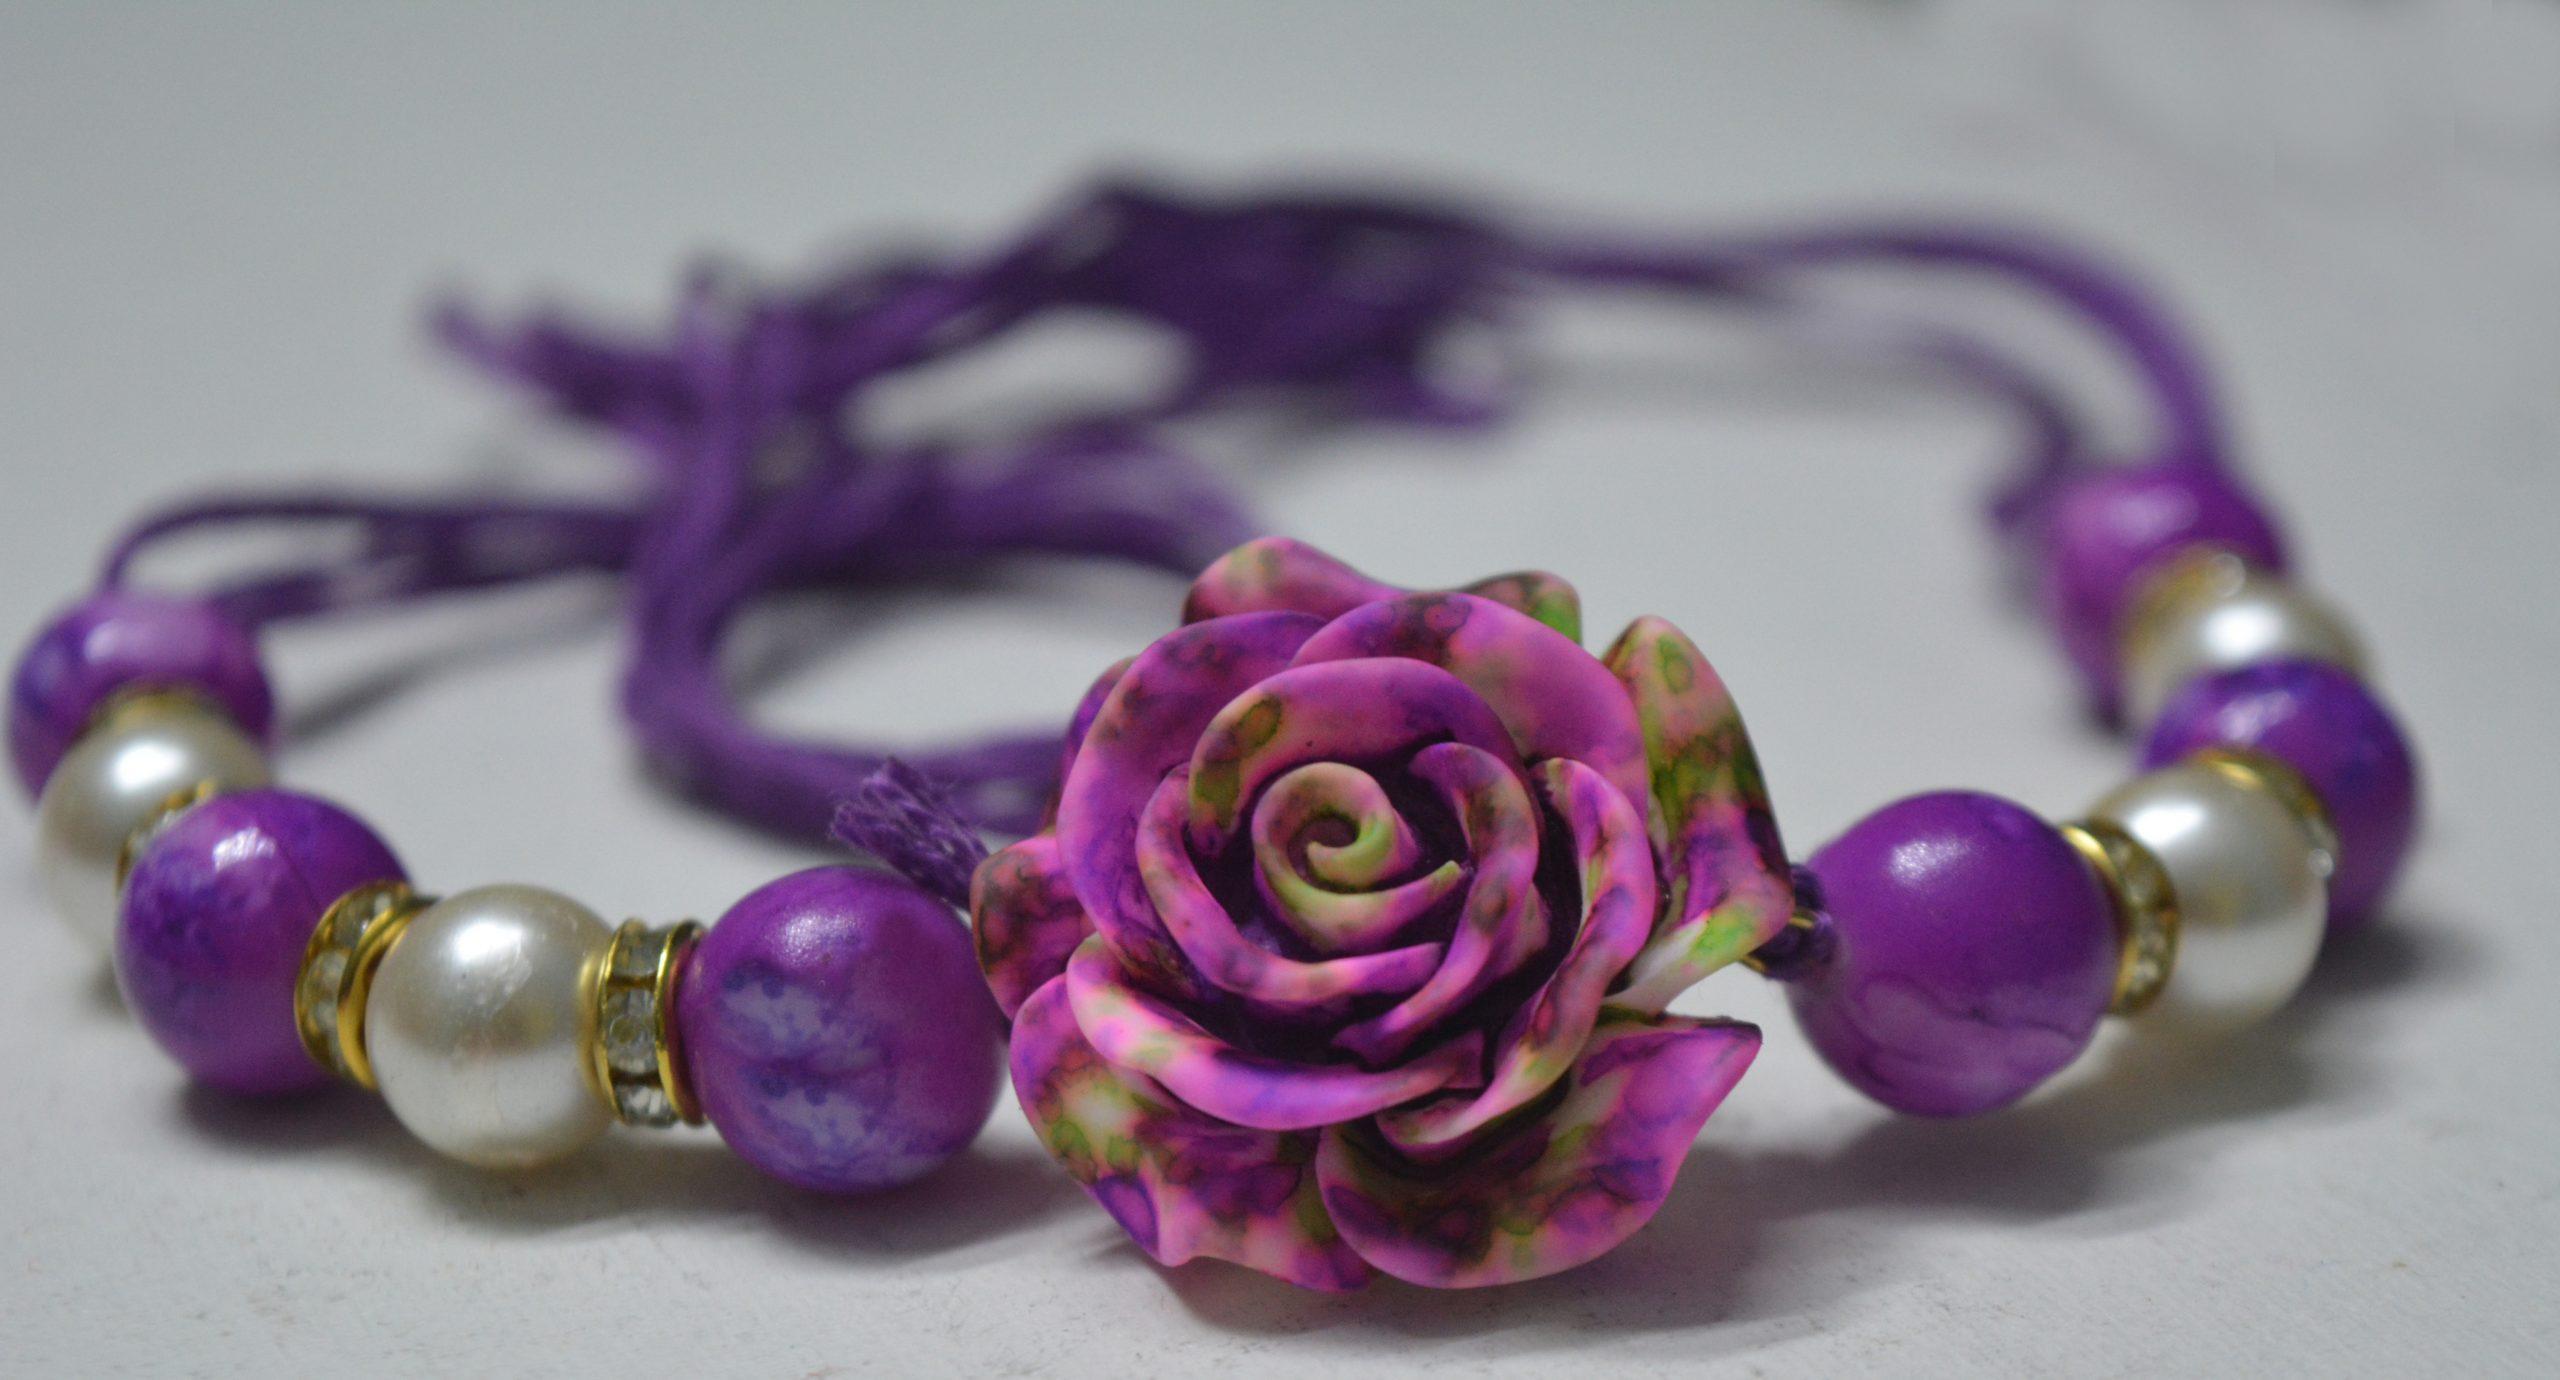 A purple coloured bracelet